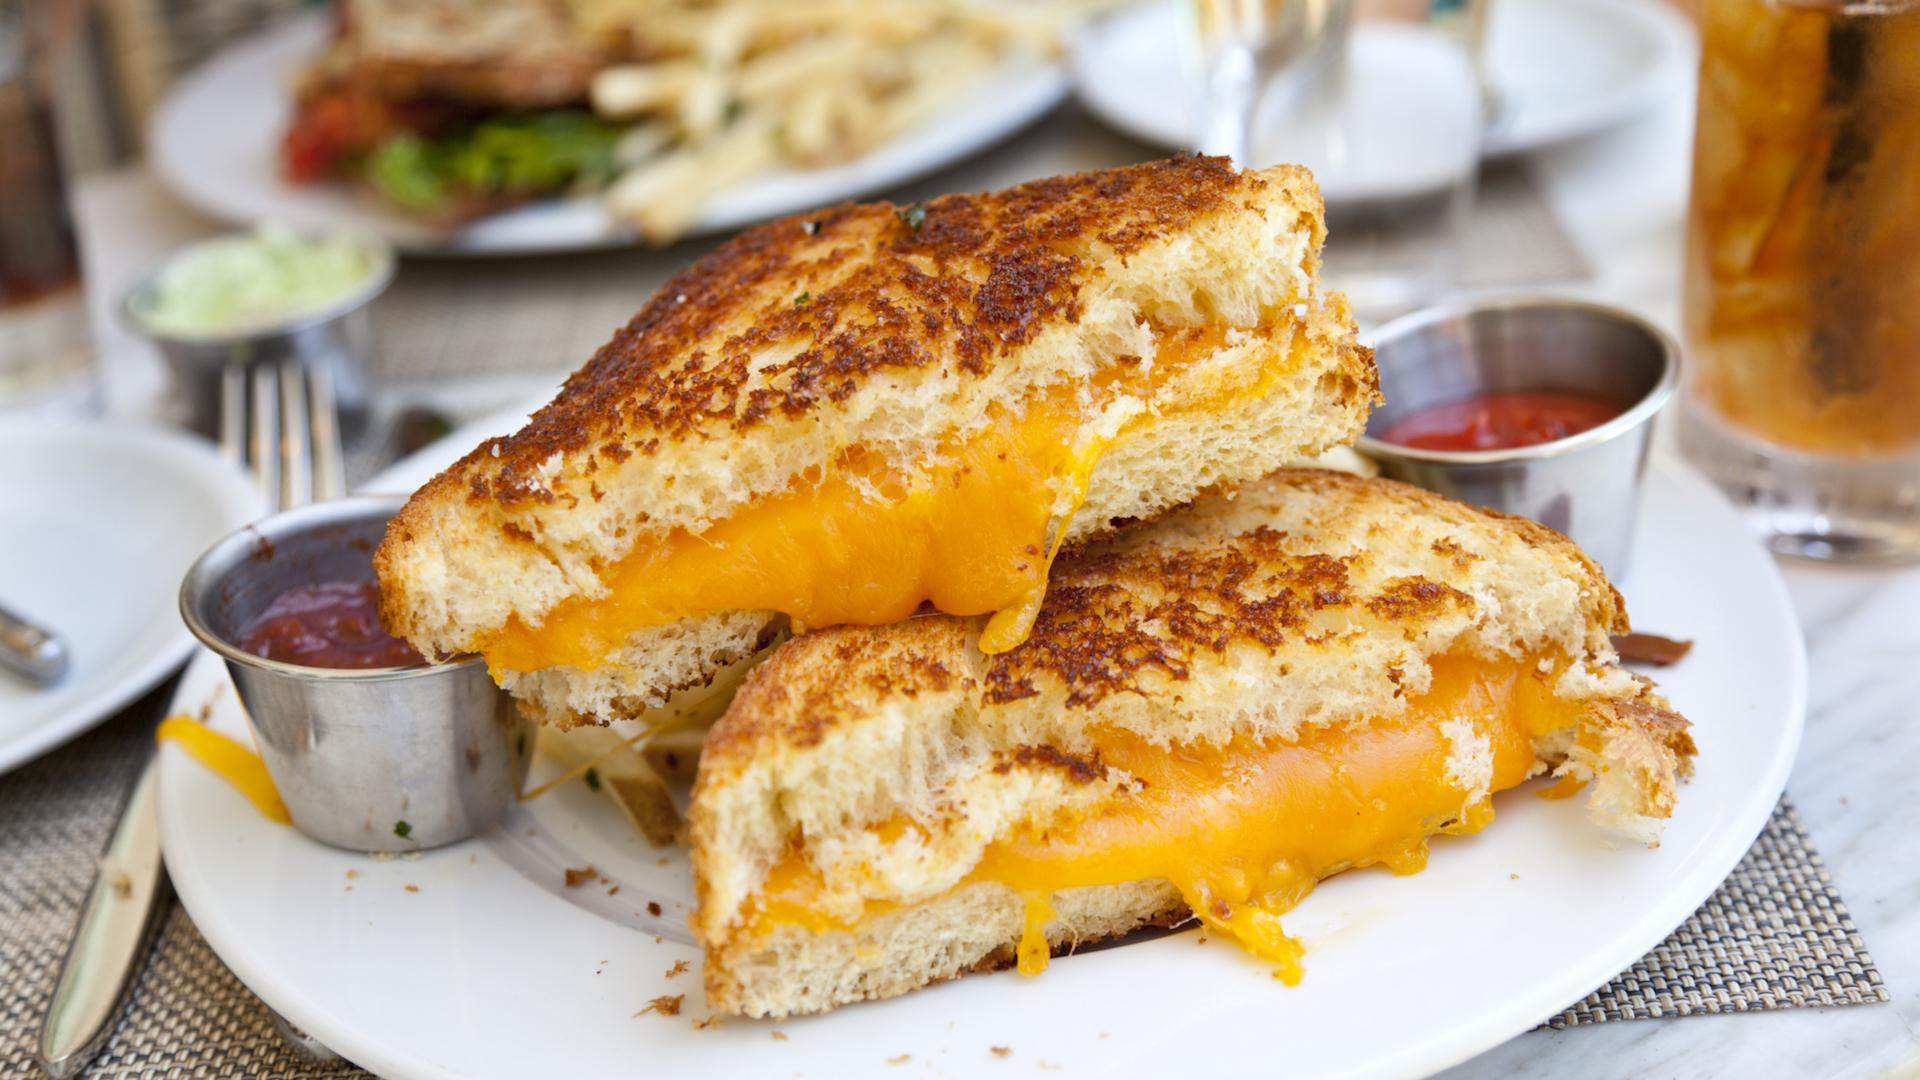 grilled cheese desktop hd wallpaper 62837